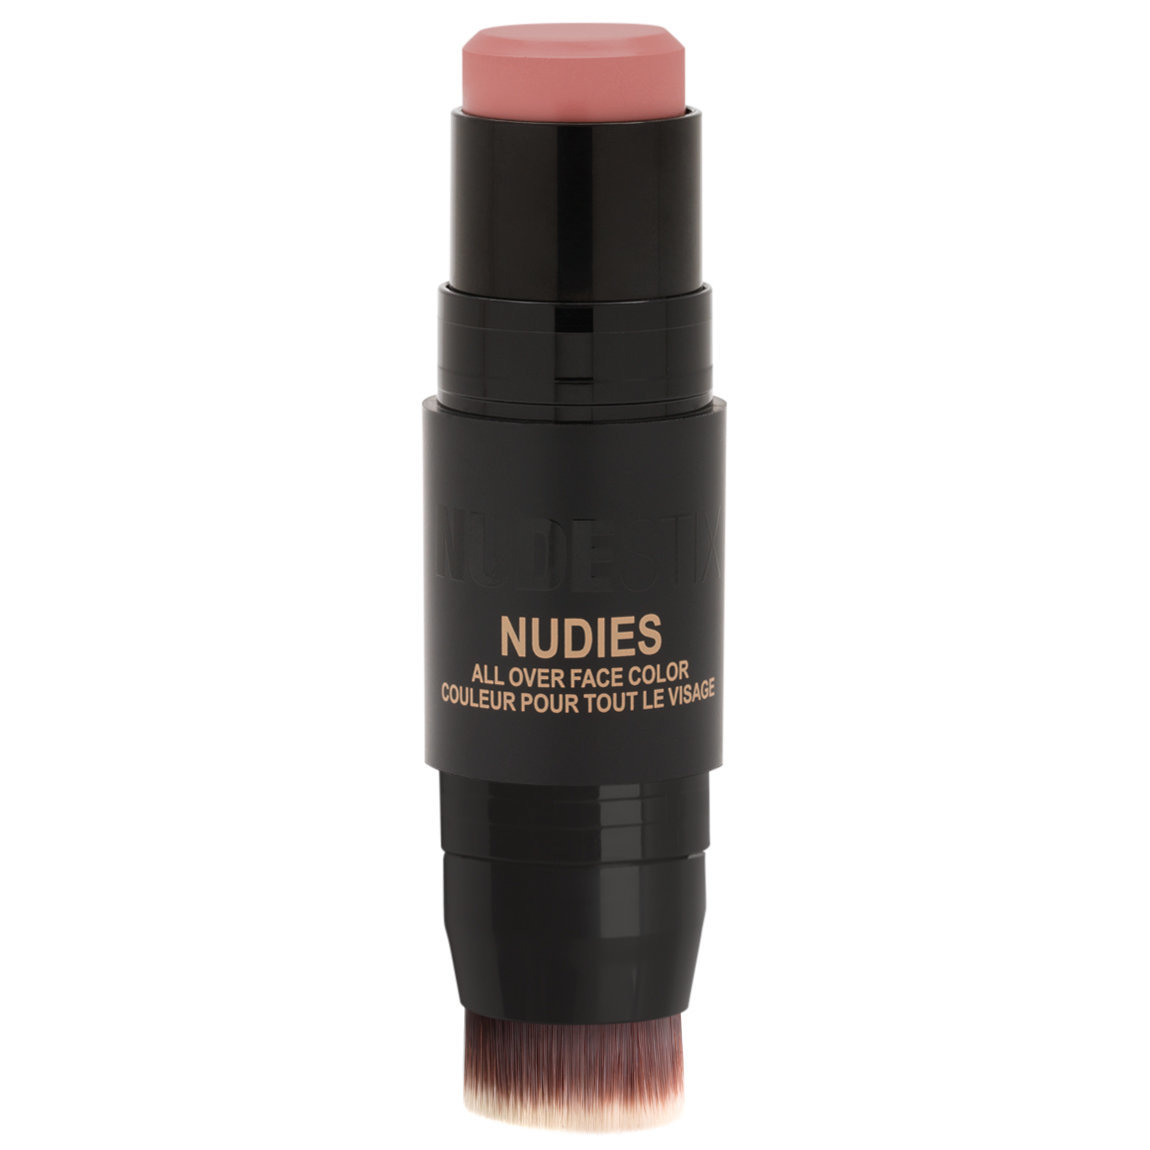 Nudestix Nudies Matte Blush & Bronze Bare Back